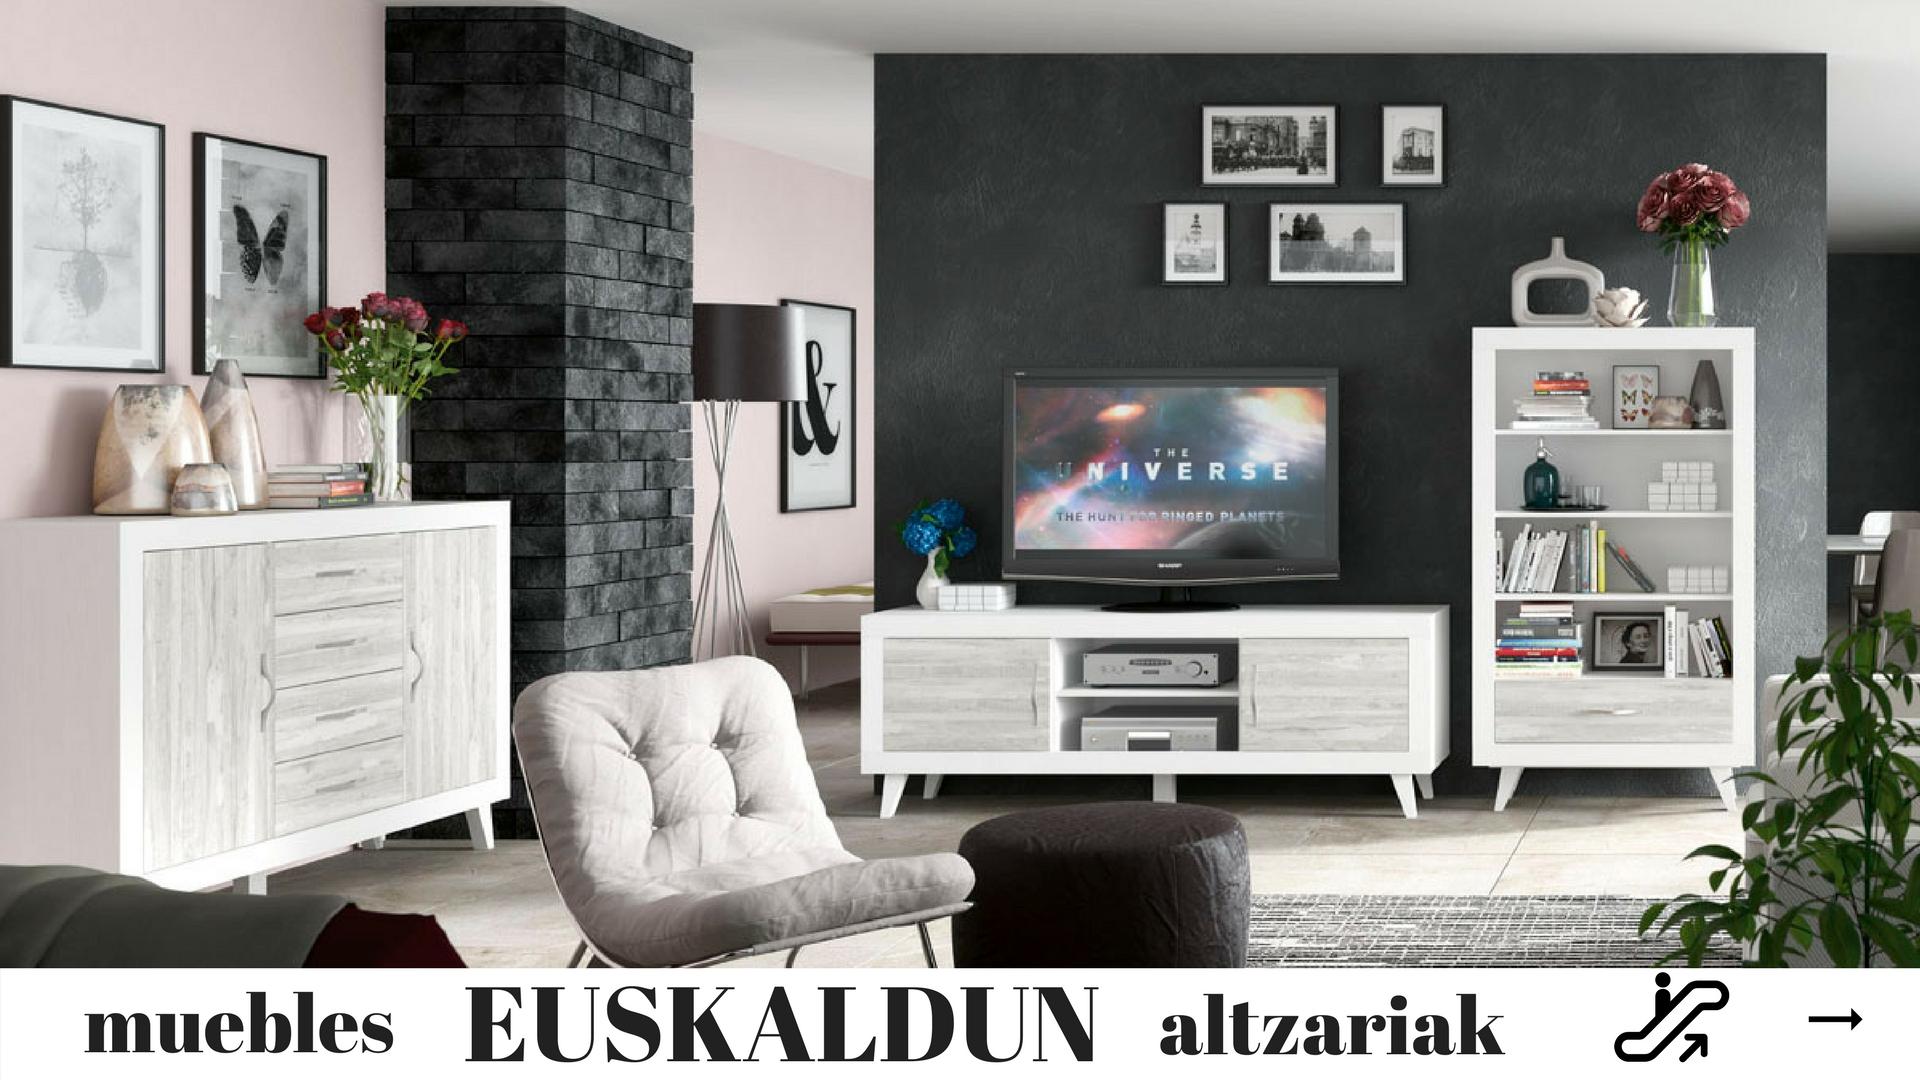 Muebles Oiartzun Mamut - Euskaldun Galer As Comerciales Mamut[mjhdah]https://www.comprarmueblesonline.net/wp-content/uploads/2017/01/estanteria-escalera-colores-dekosular.jpg